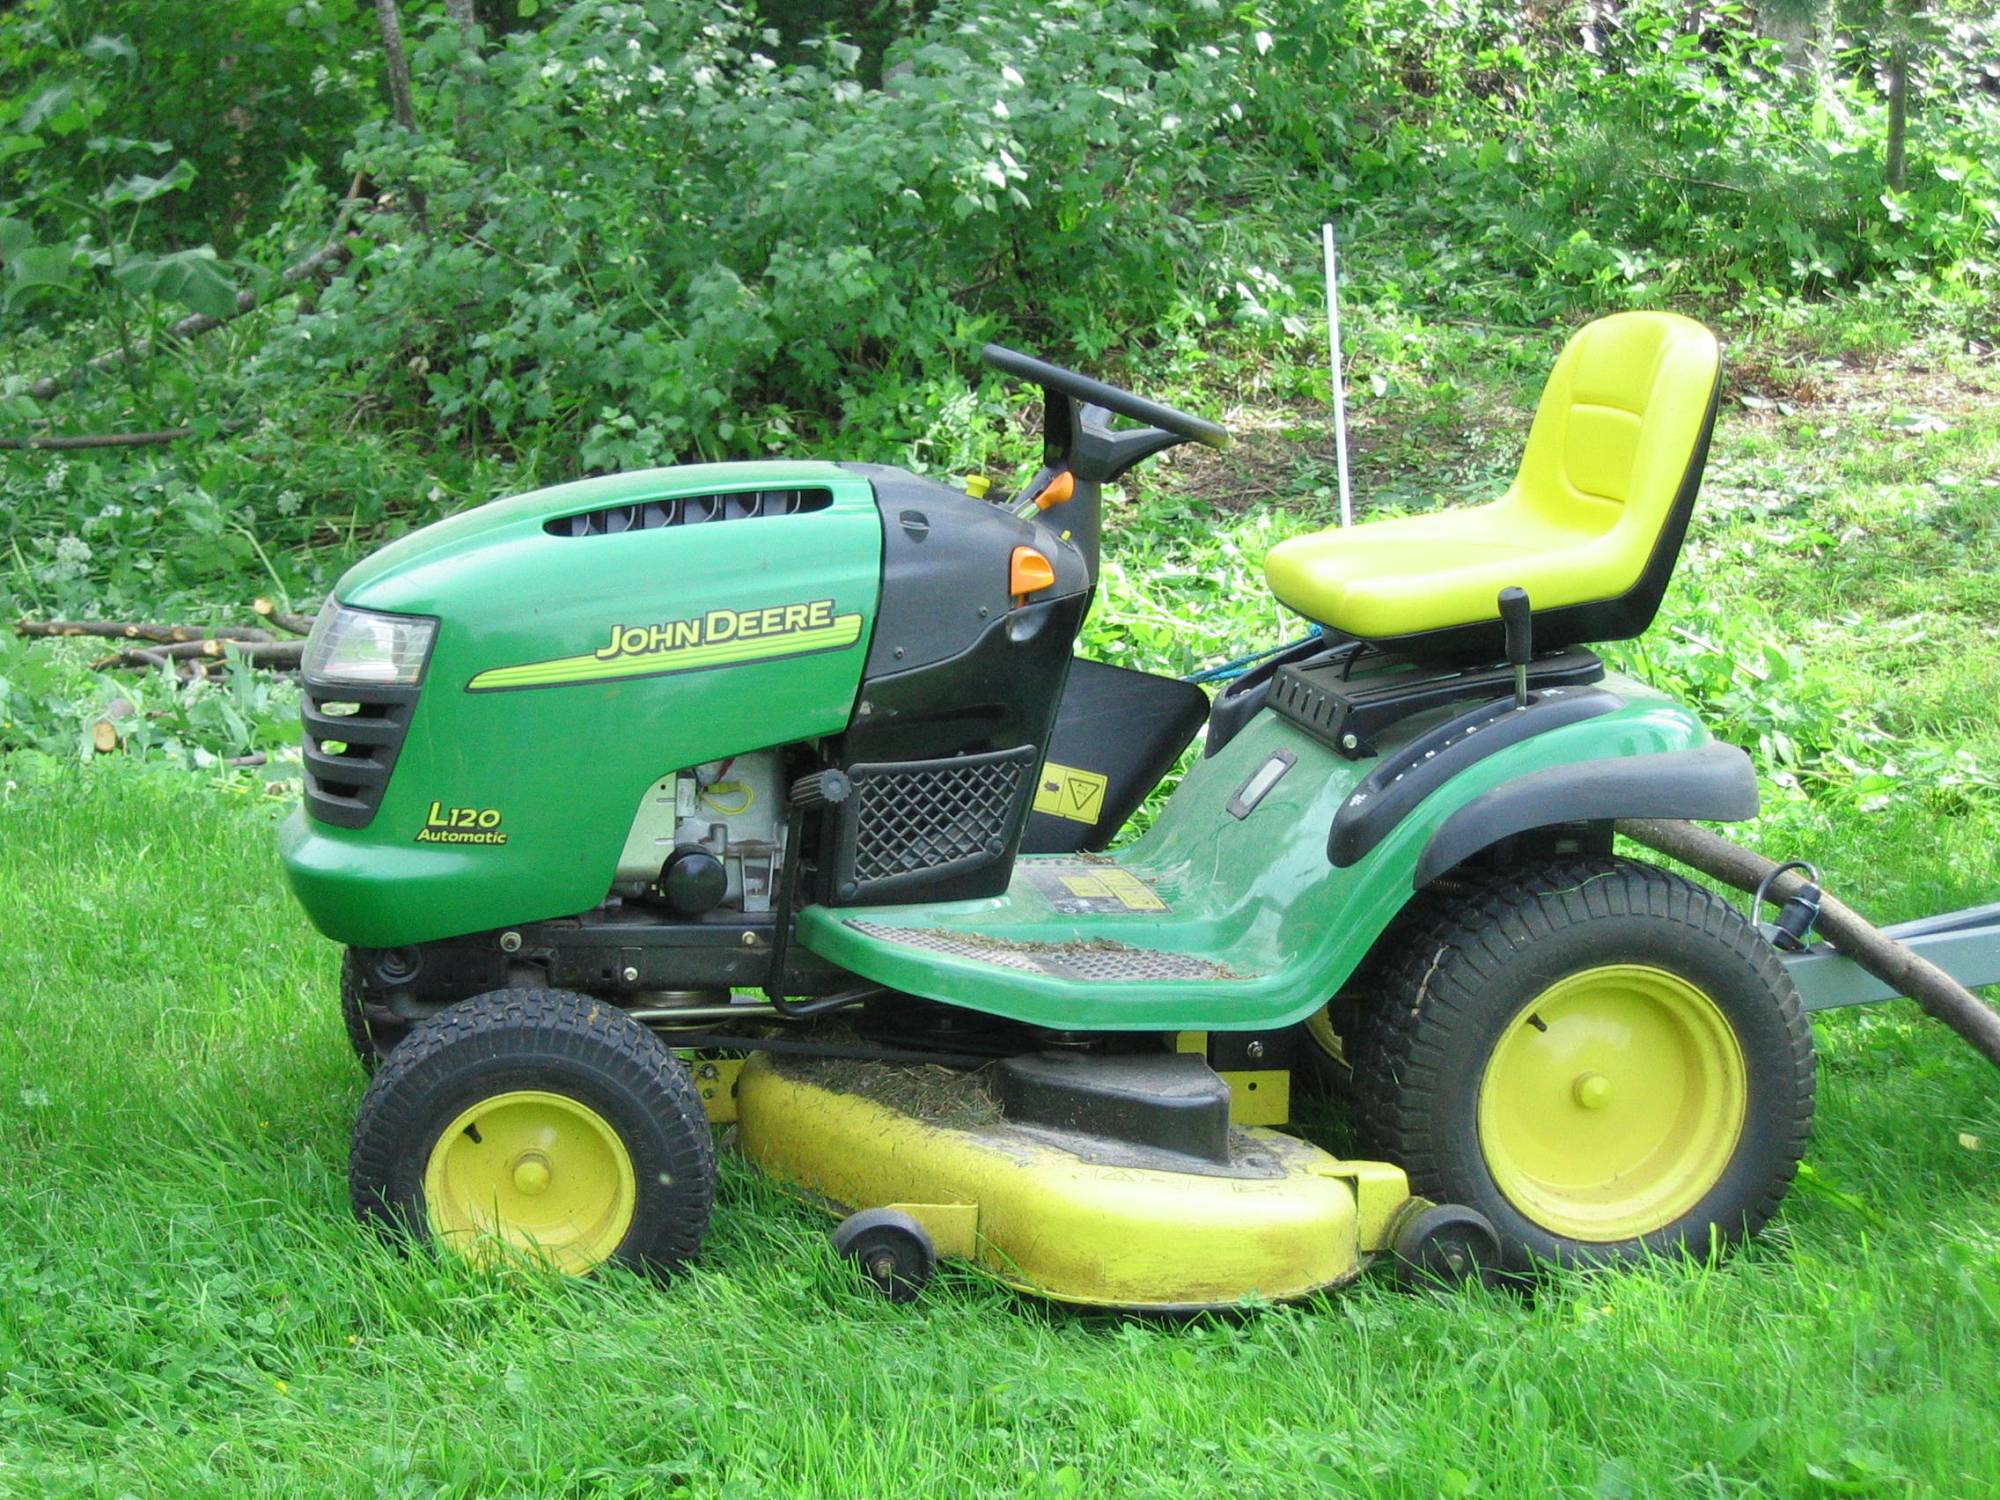 hight resolution of file john deere lawn mower jpg